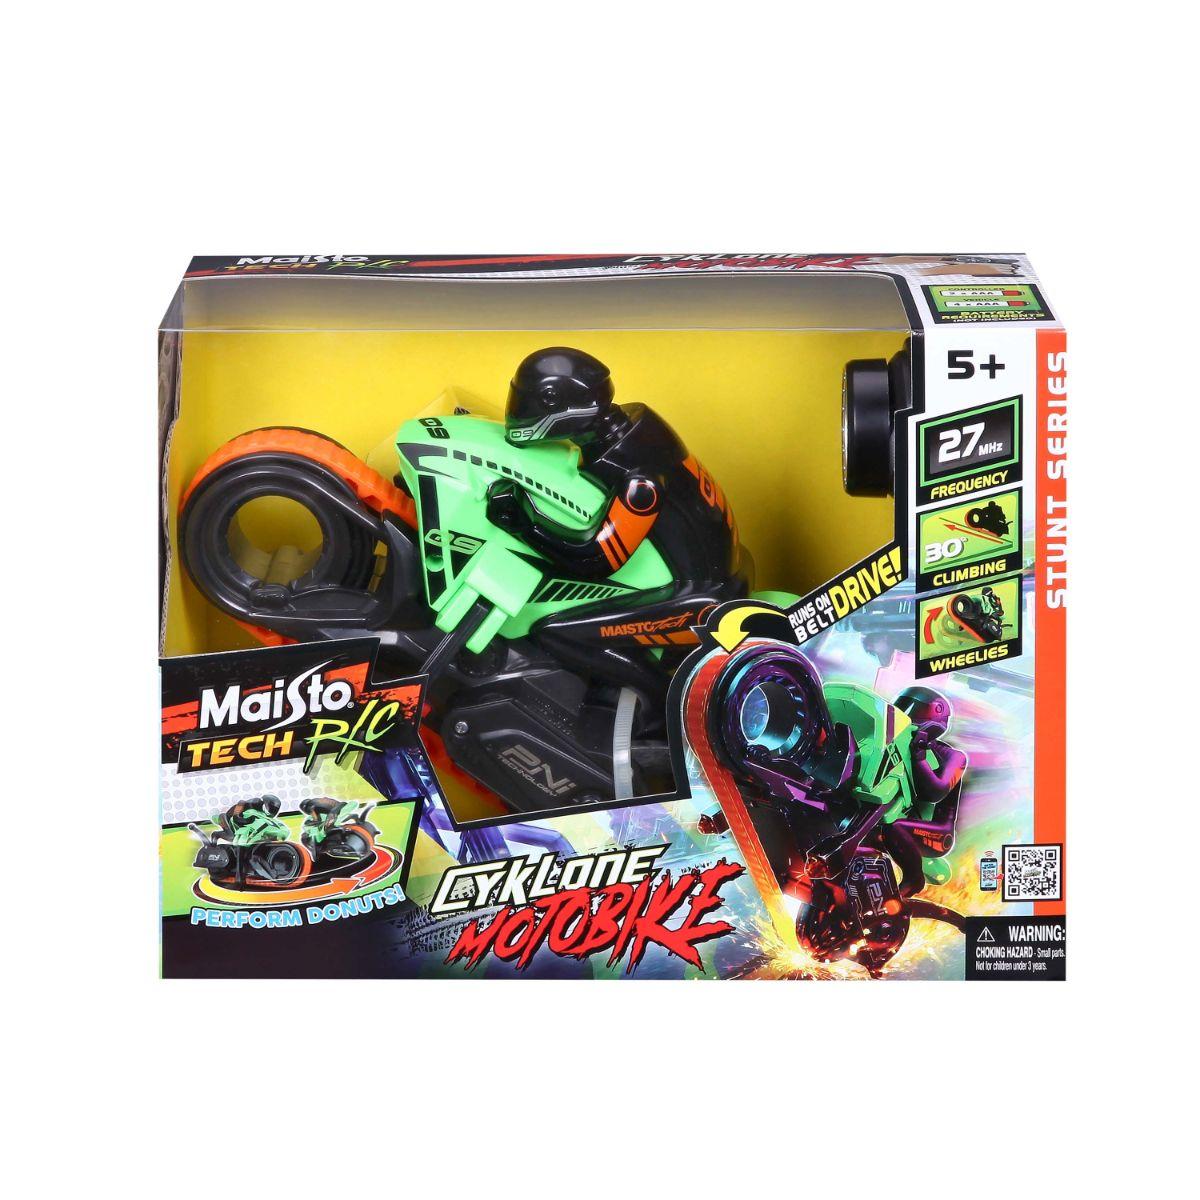 Motocicleta cu telecomanda, Maisto, Tech Cyklone Motobike, verde